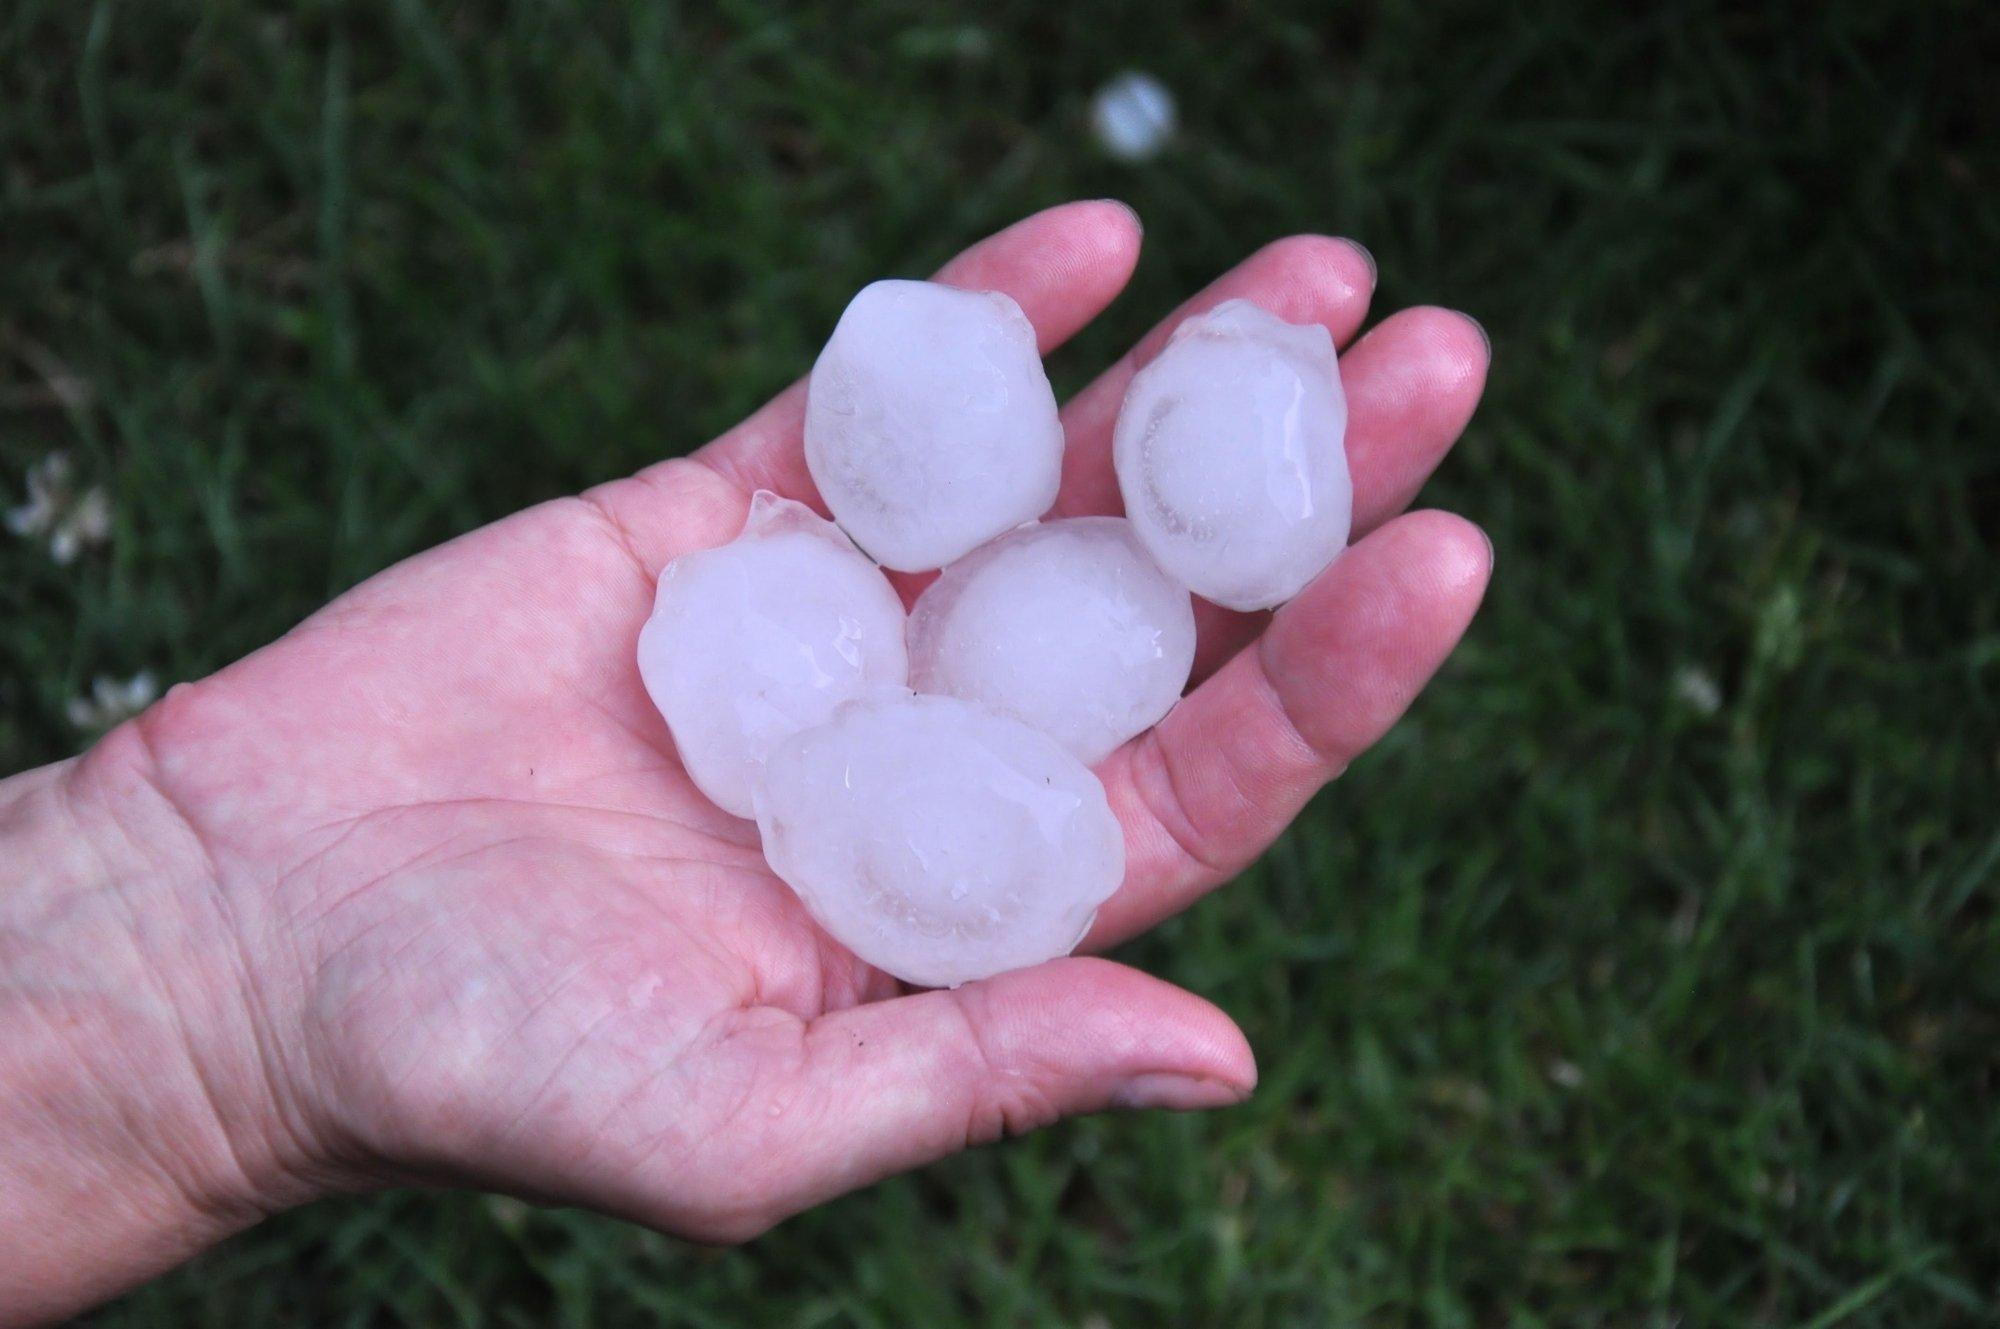 Big hailstone on the hand